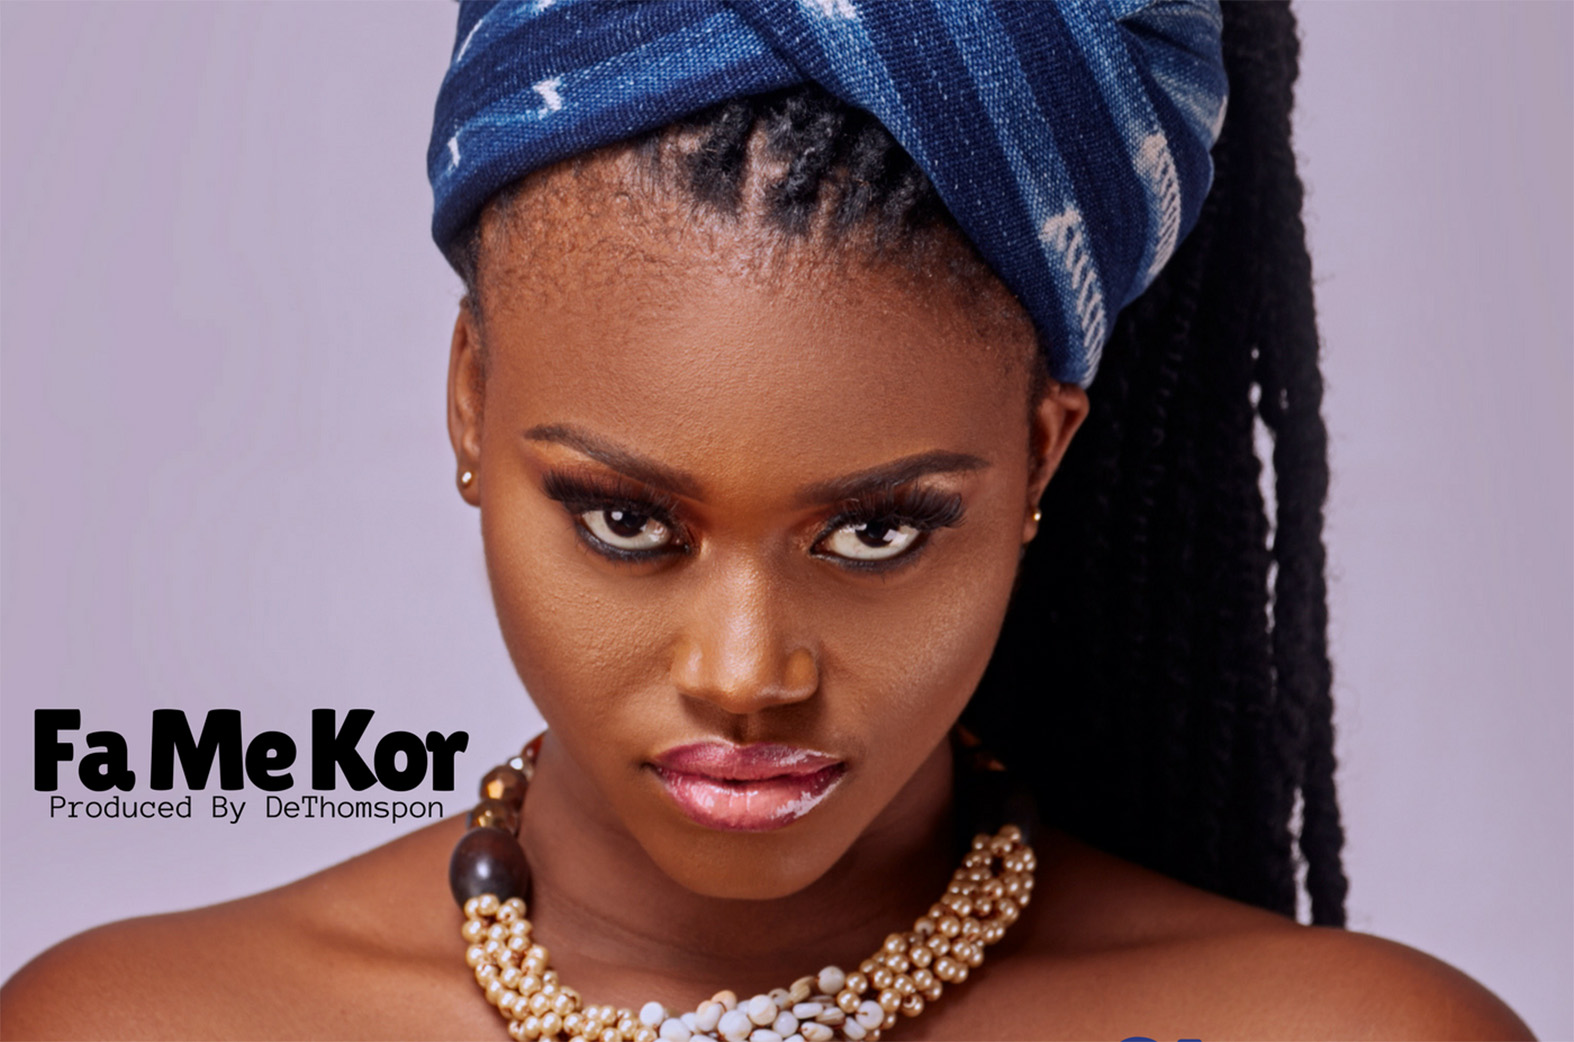 eShun drops audio & visuals for 'Fa Me Kor' as she readies 'Untamed' Album